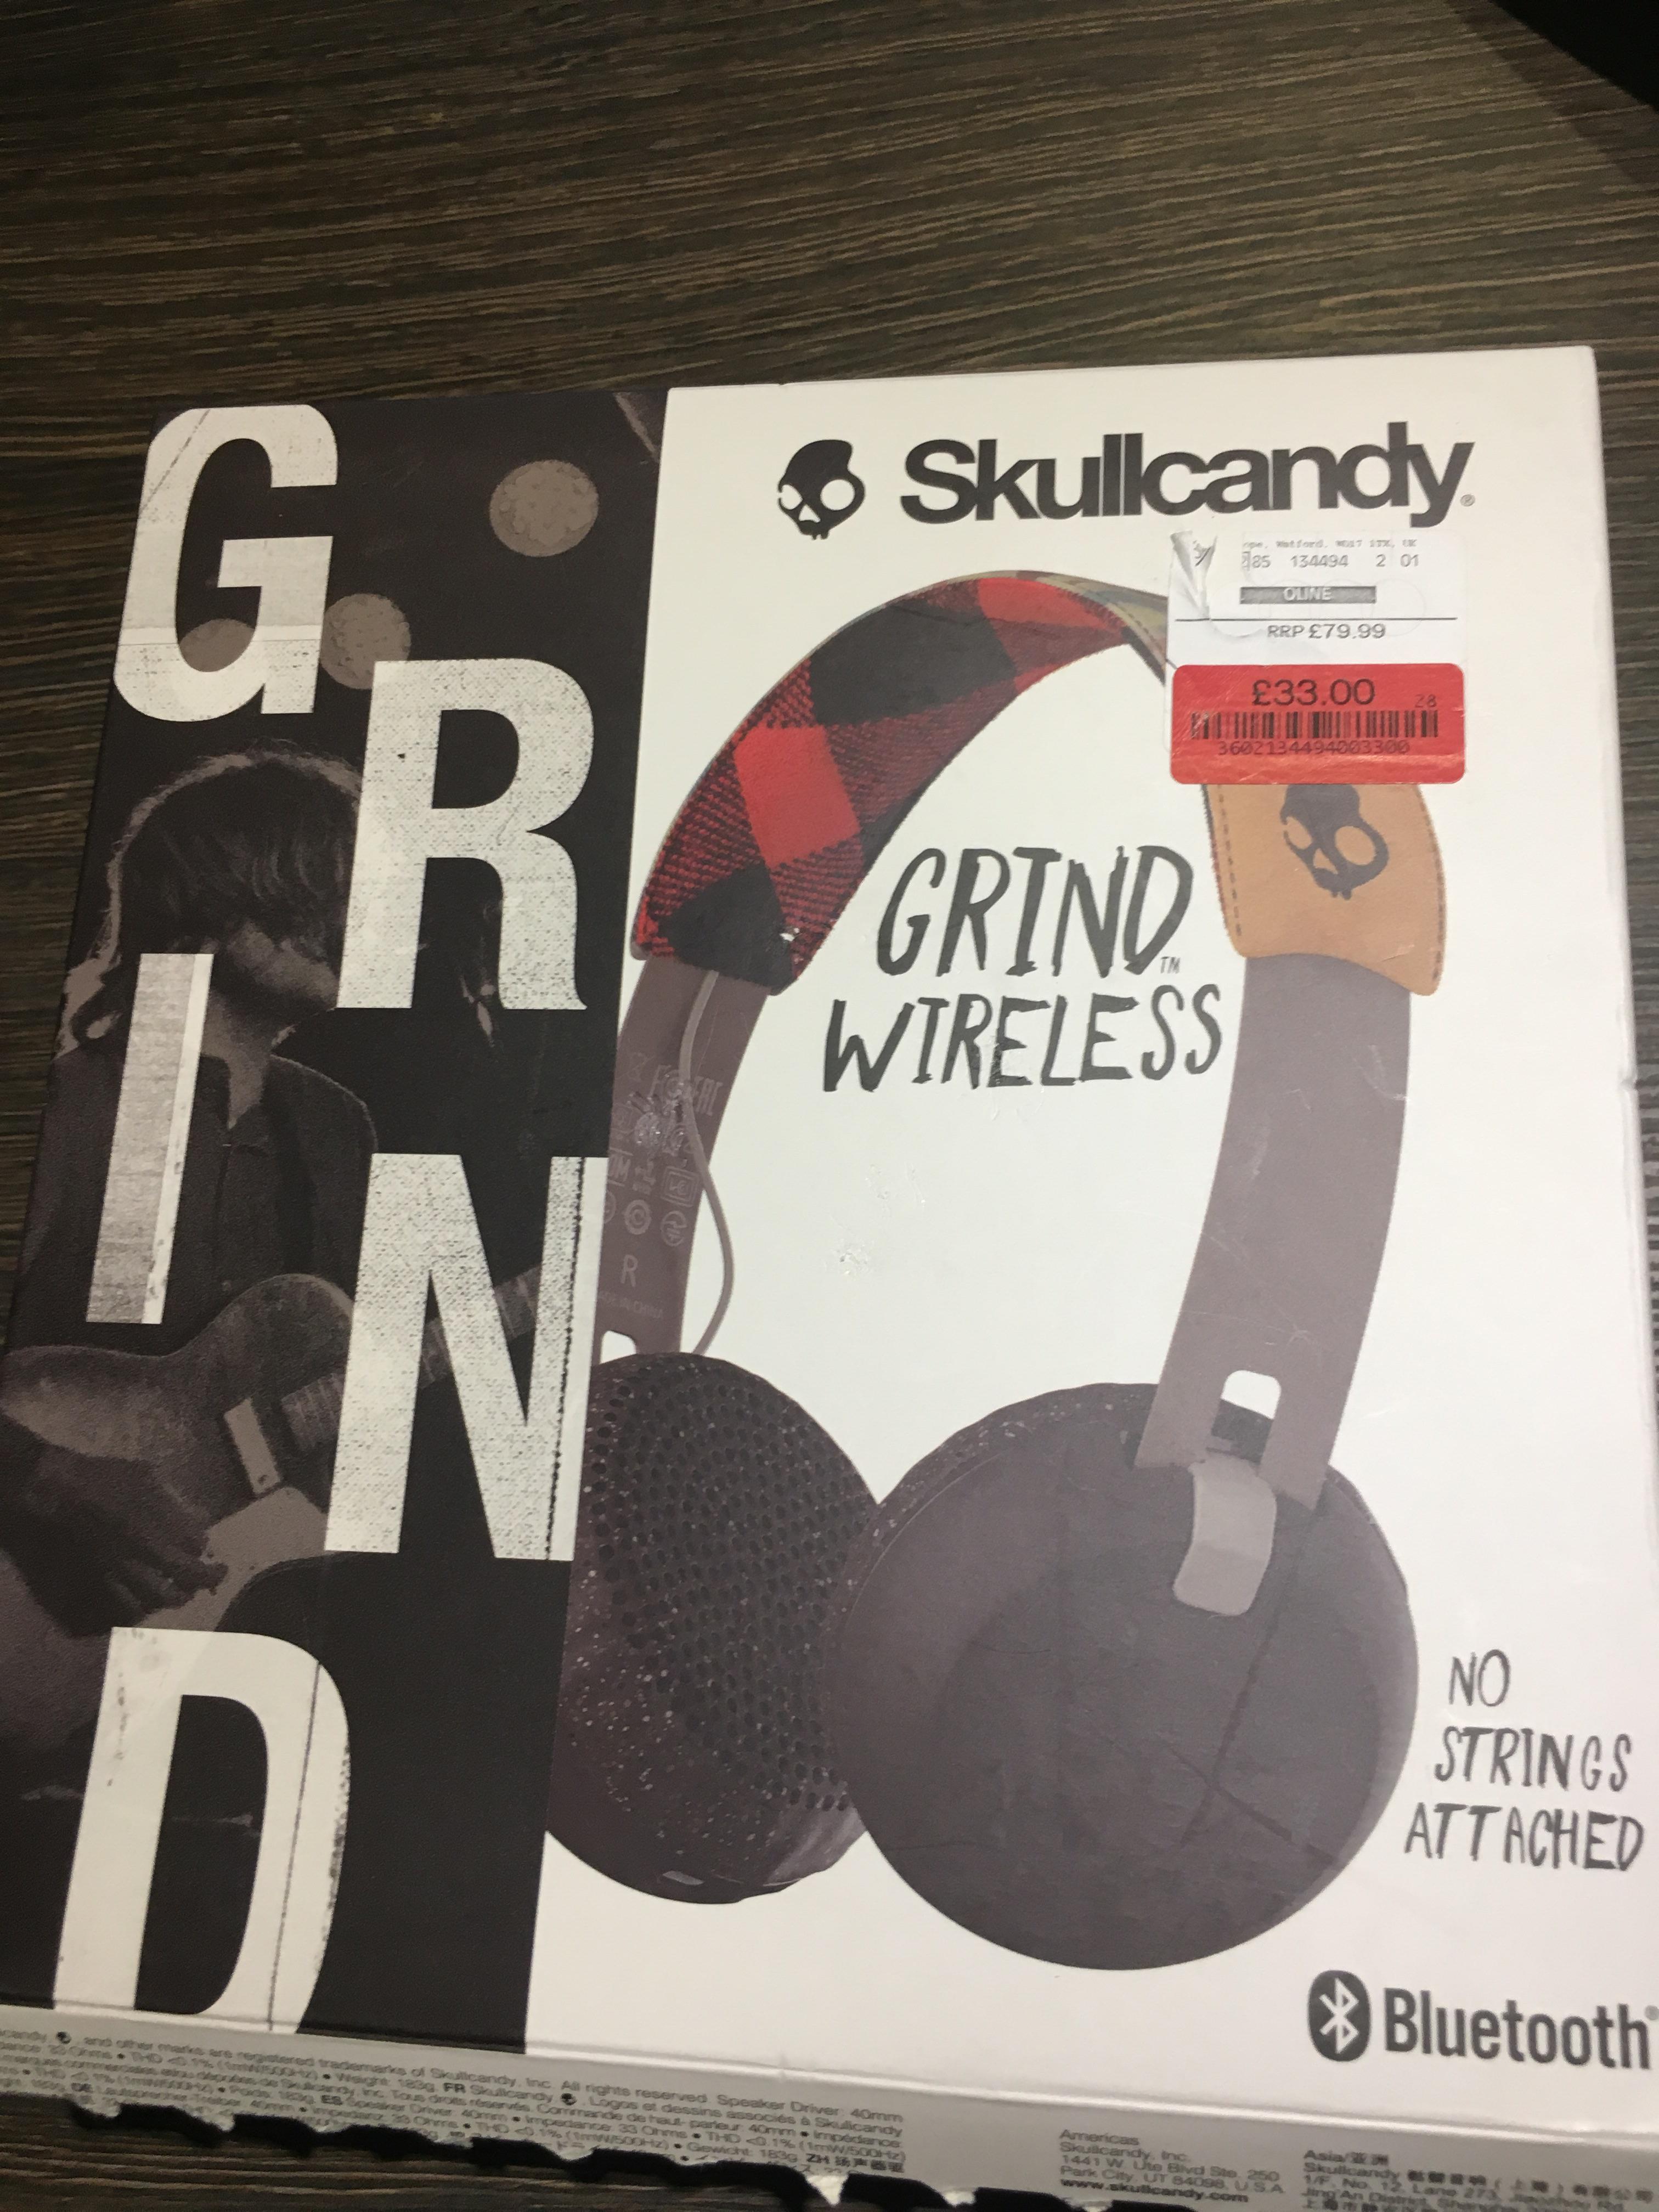 Skullcandy Grind Bluetooth Wireless Headphones £33 Instore TK Maxx